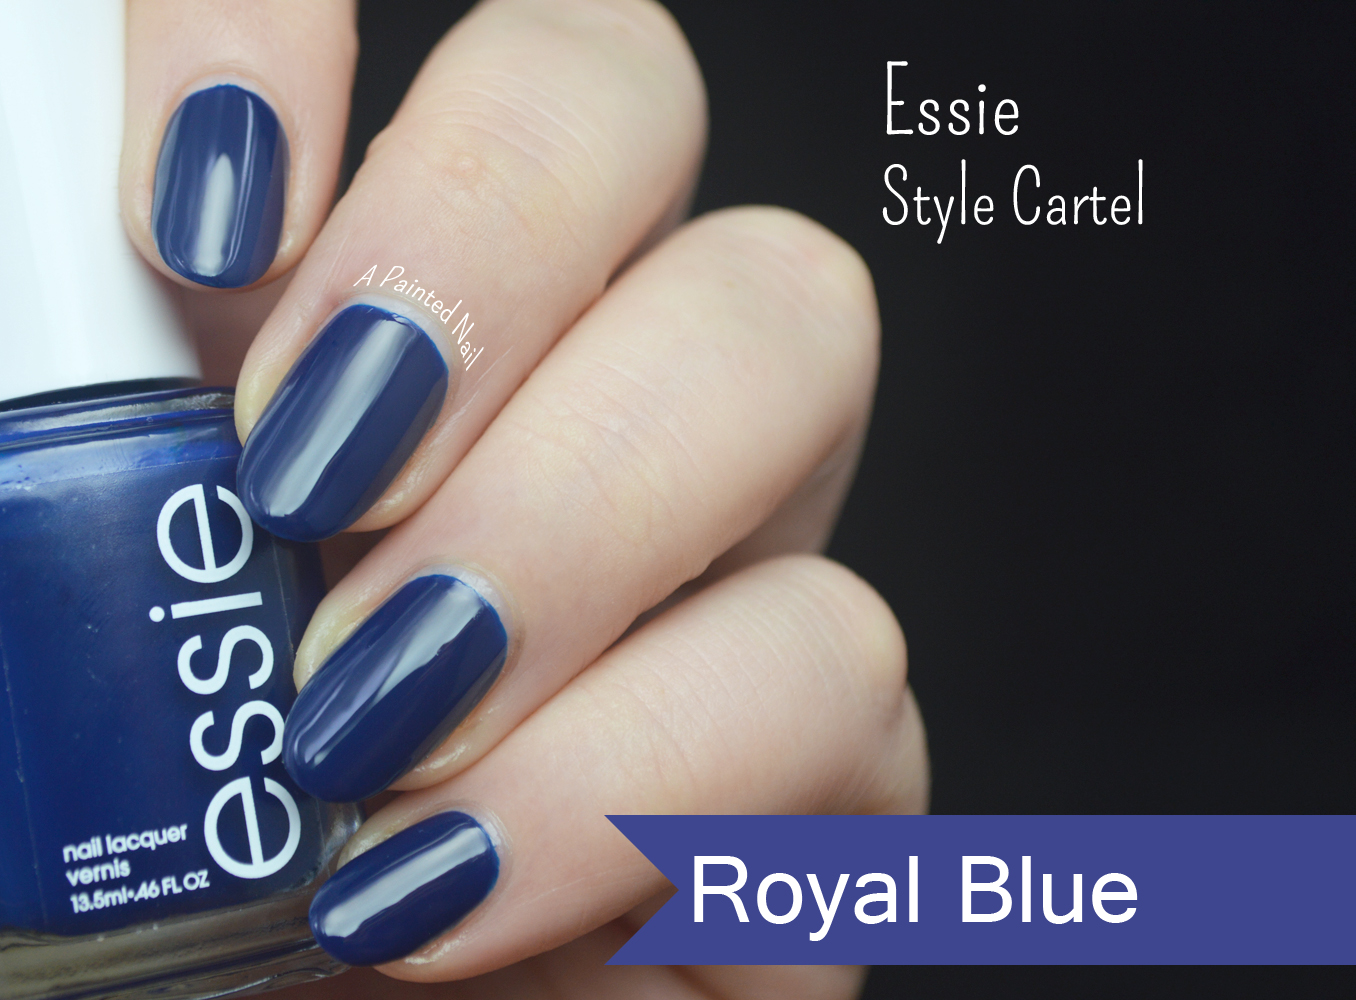 Royal Blue Nail Polish Essie - Absolute cycle